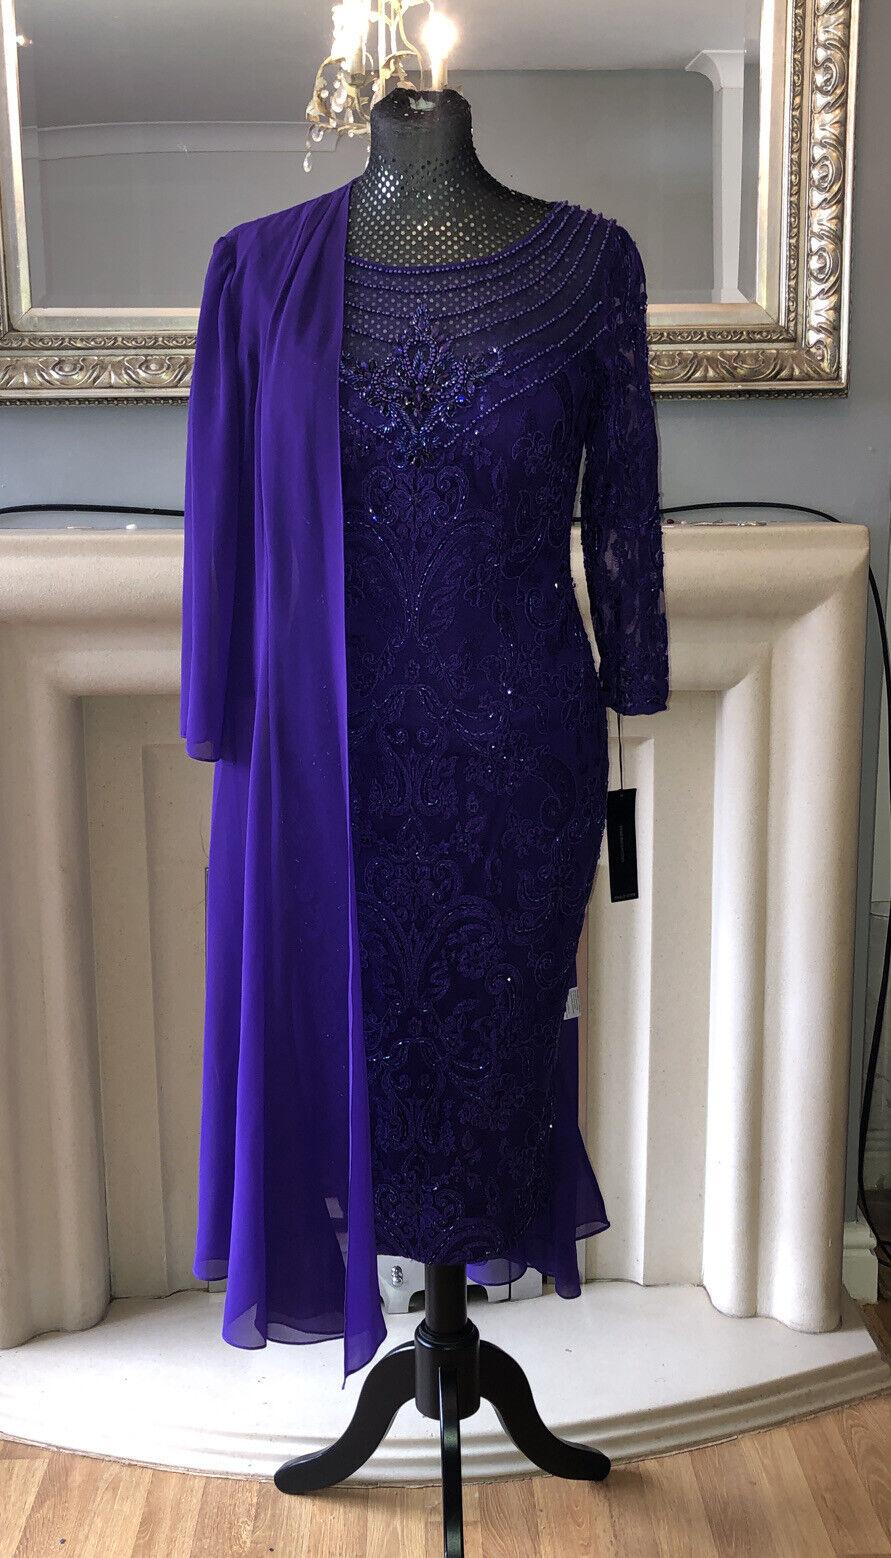 veni infantino 991329 Indigo Purple Sz 10 Bnwt Rrp Mother Of The Bride